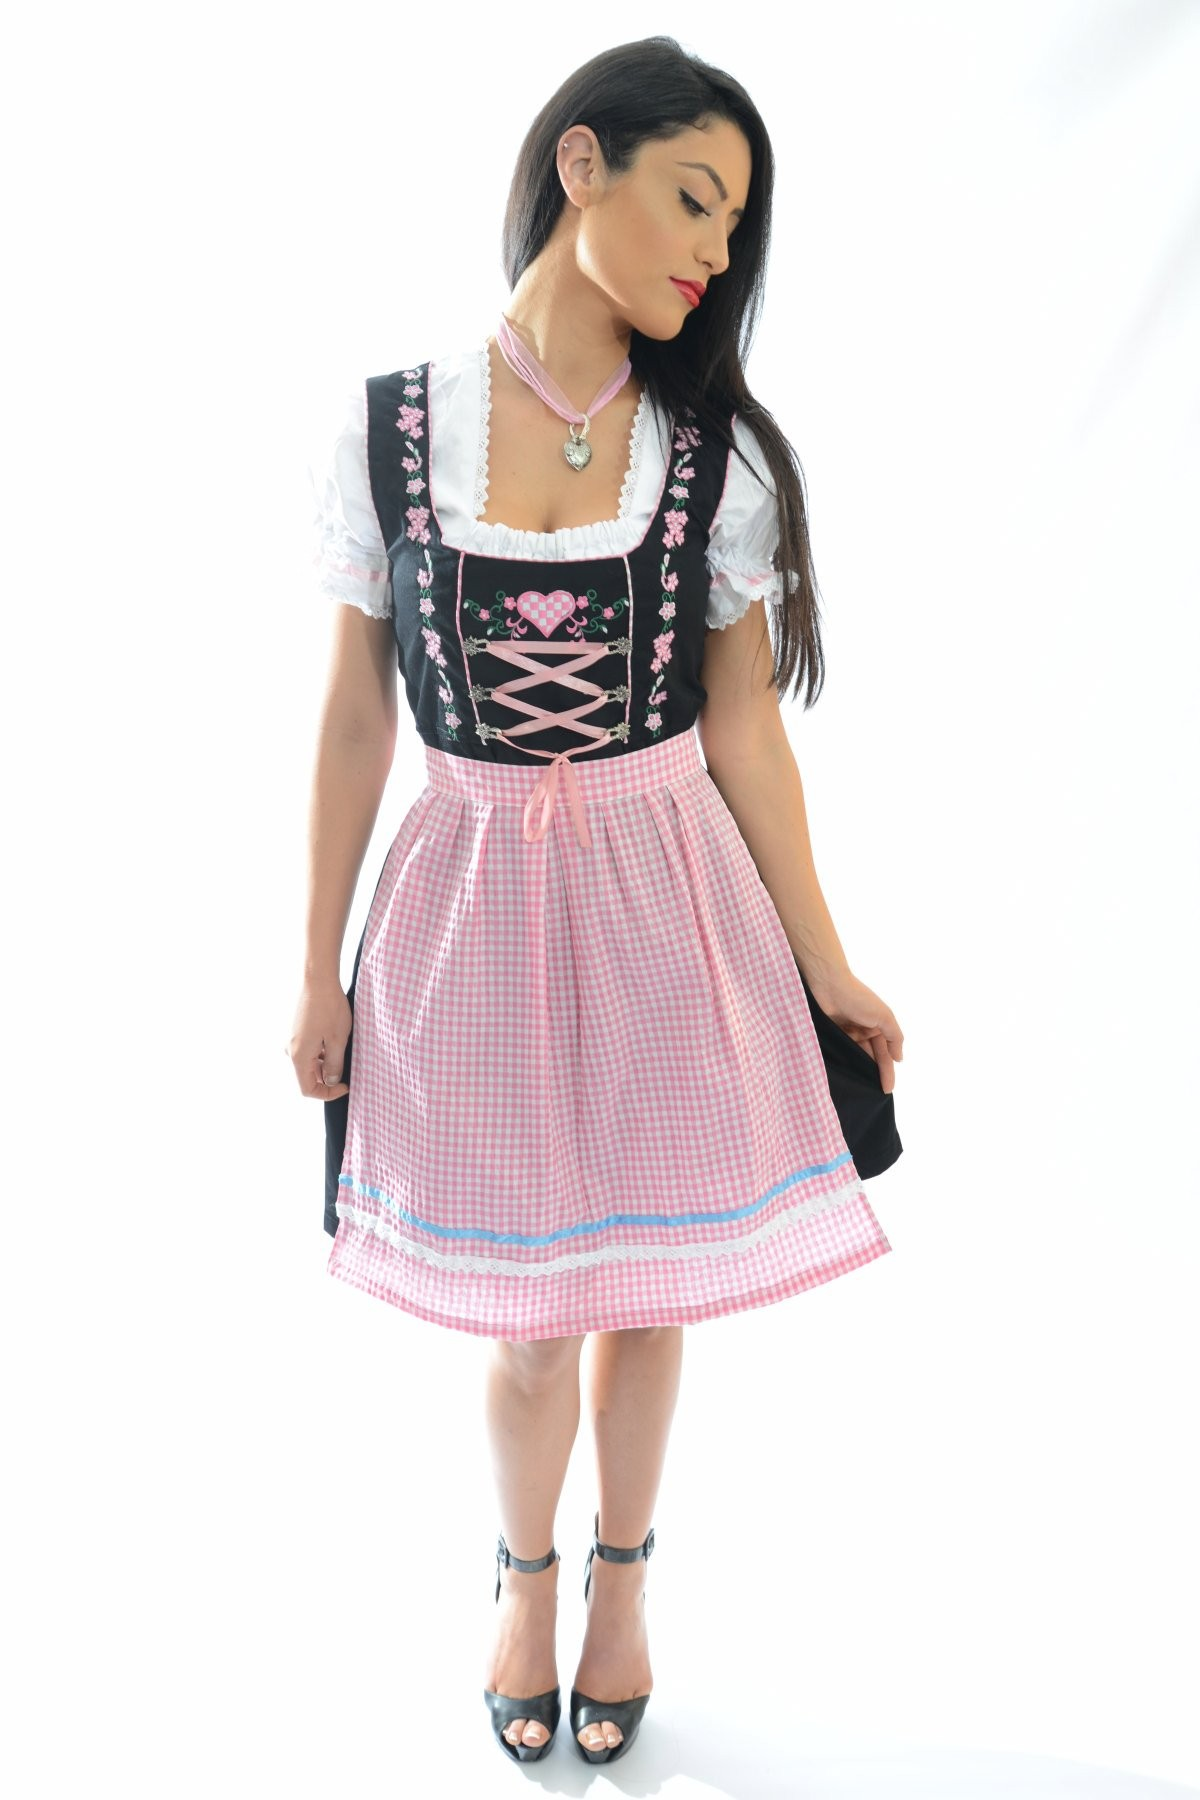 Dirndl Dress Picture Collection Dressedupgirl Com